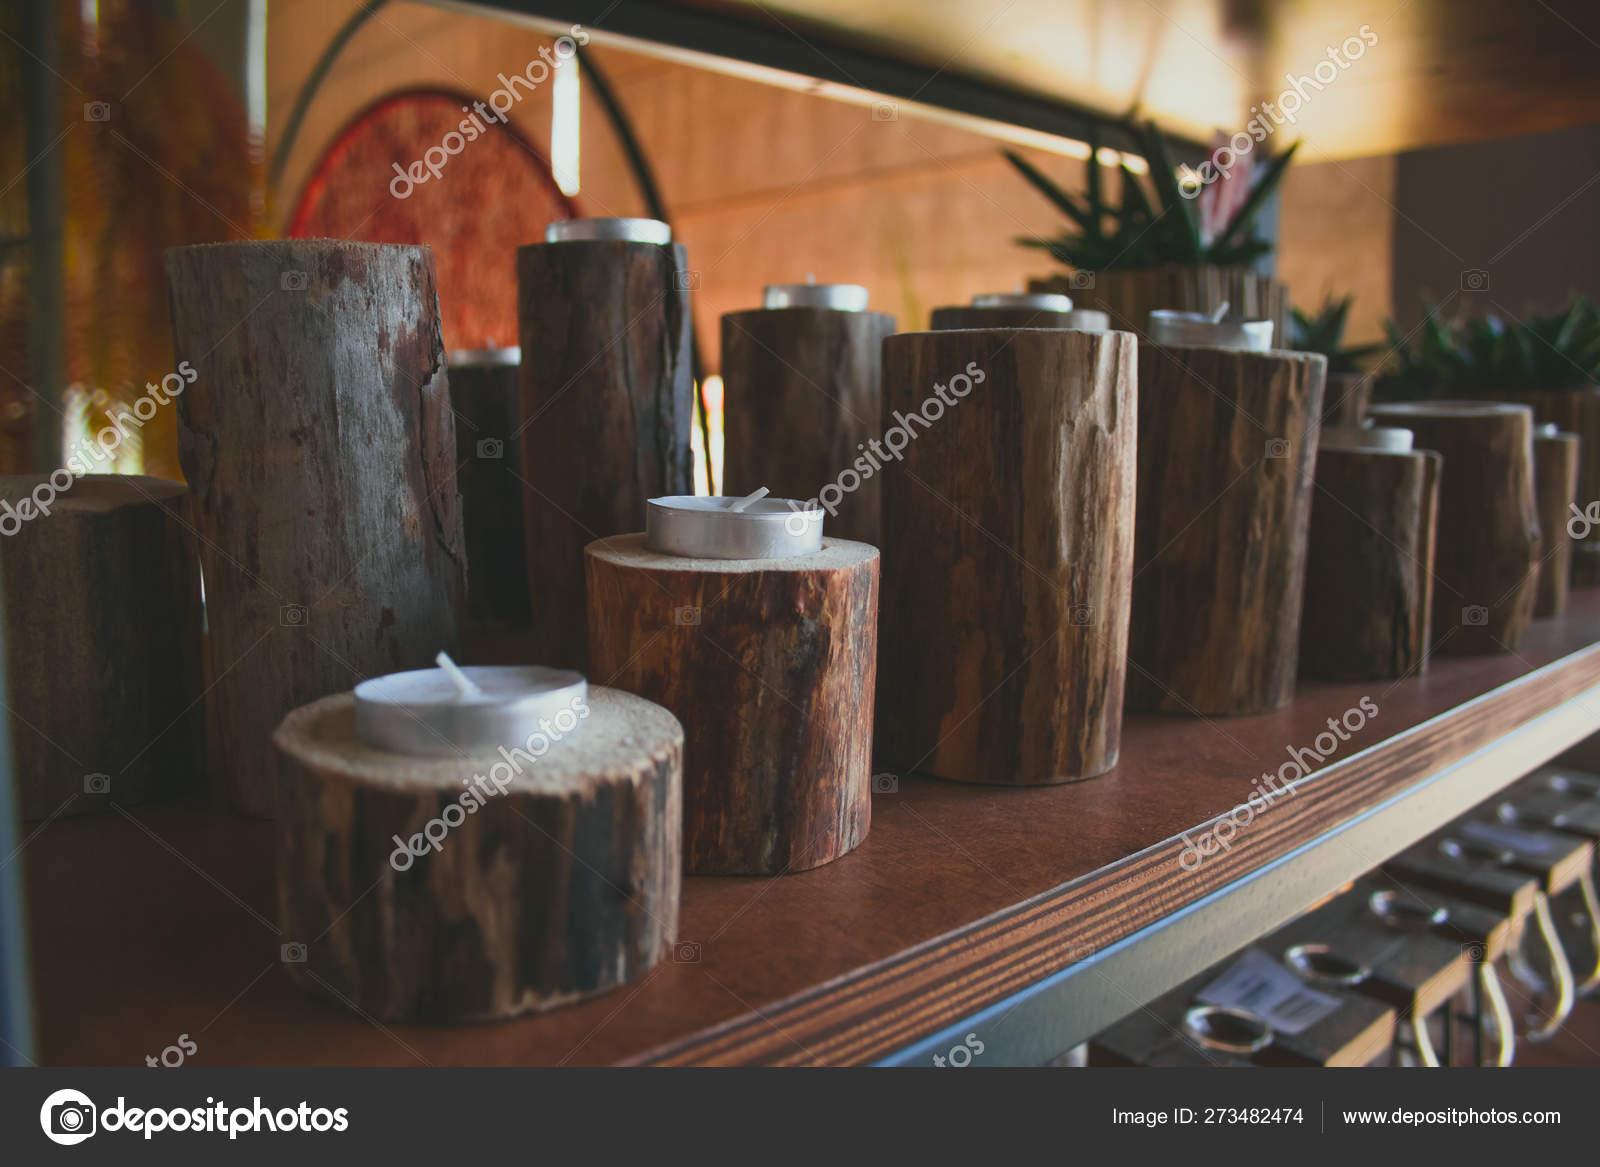 Shelf Candles Wooden Candlesticks Cozy Home Rustic Decor